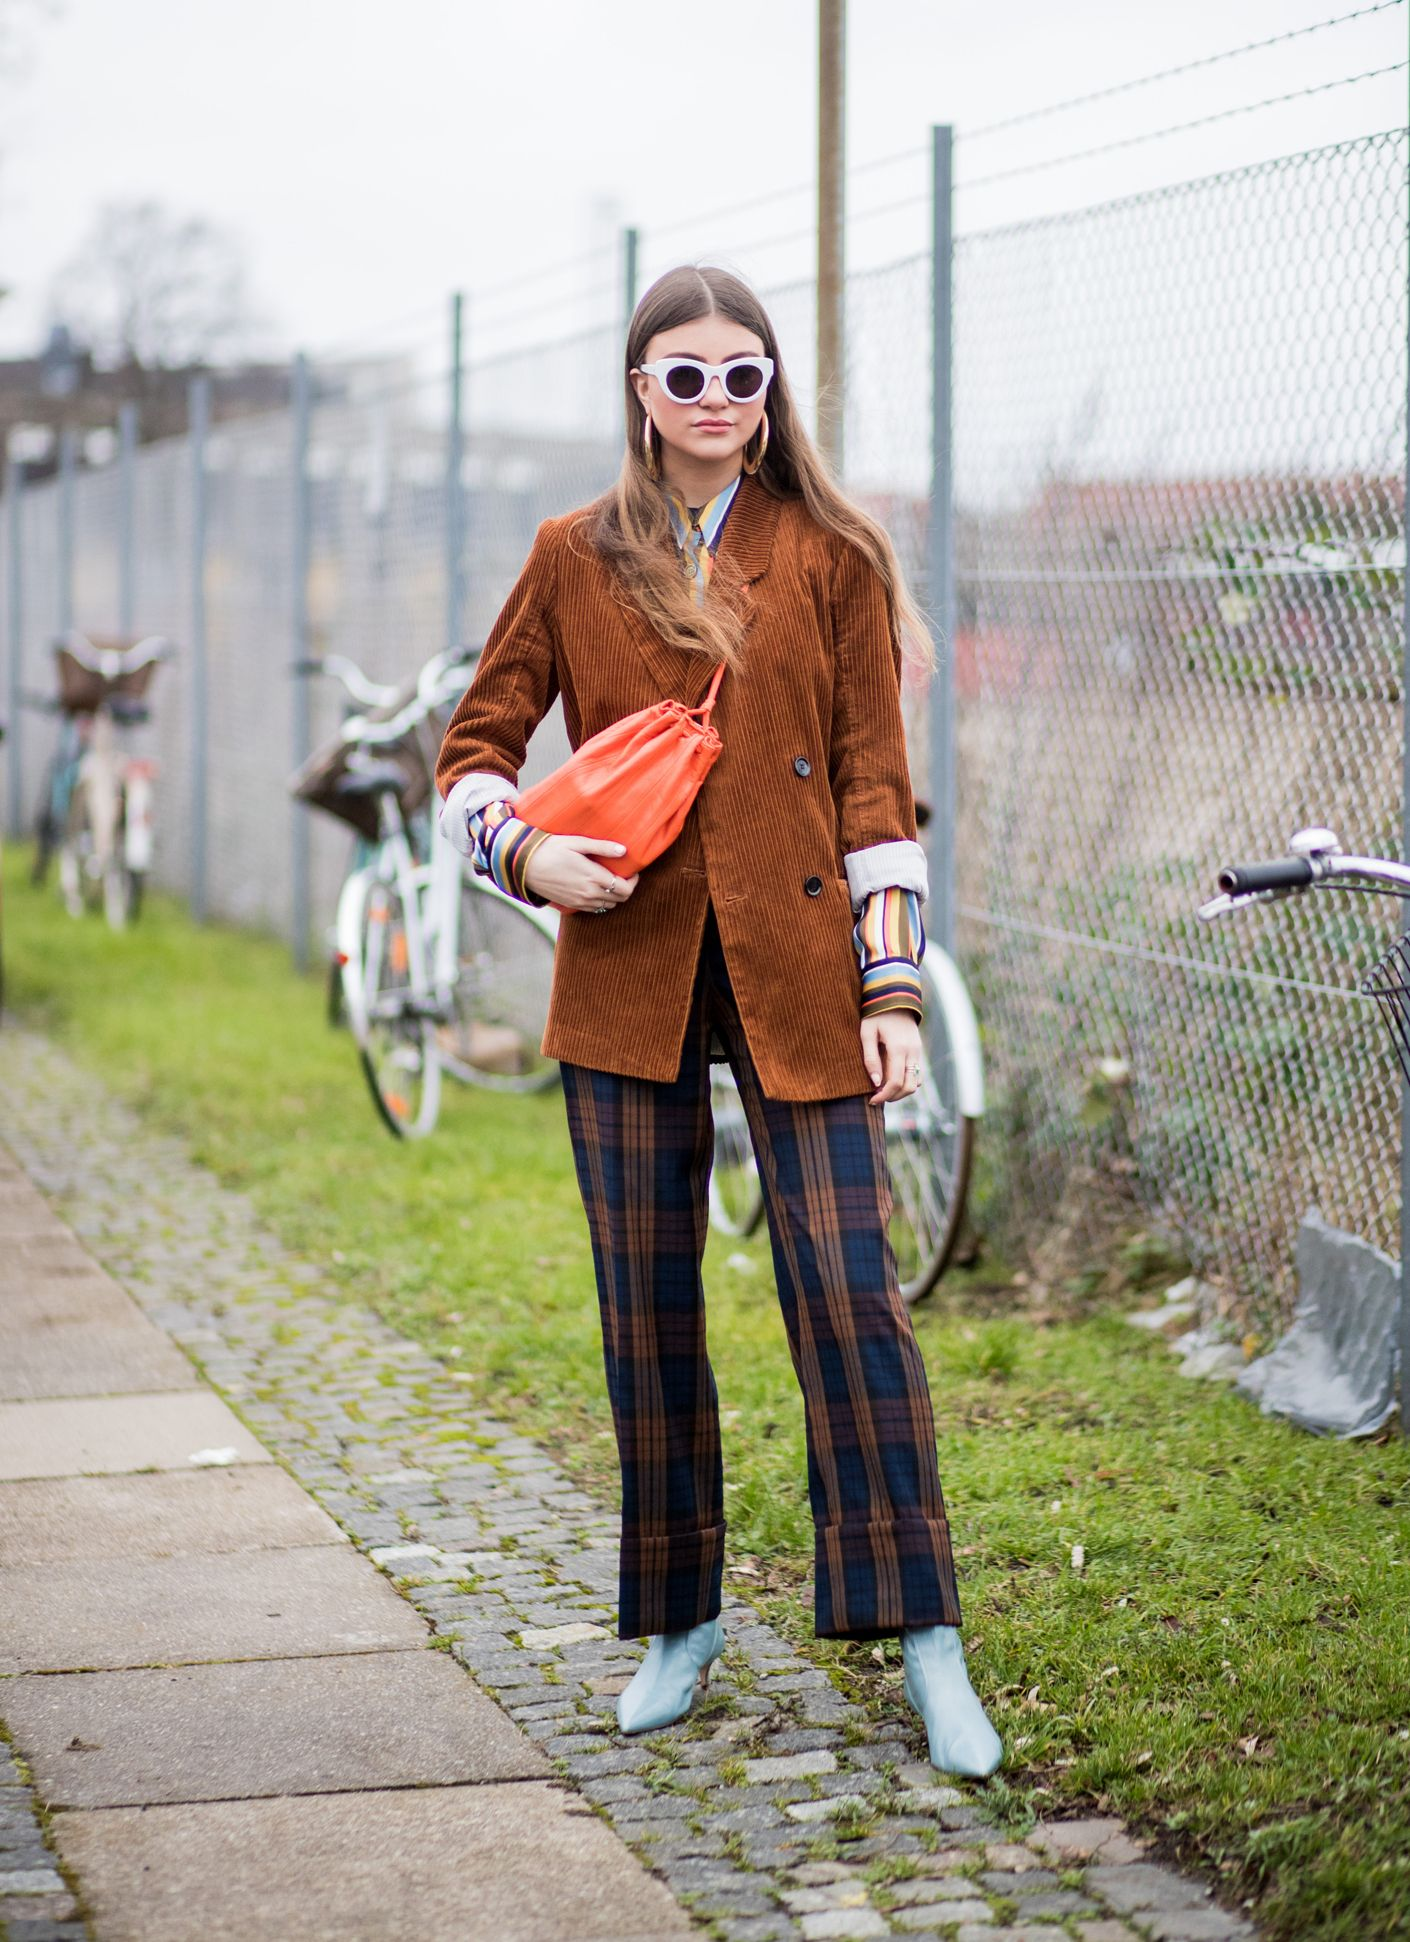 Donna Modelli Pantaloni Moda Di 2018 5wqzcgt4 Tendenza I 6v7gyYbf